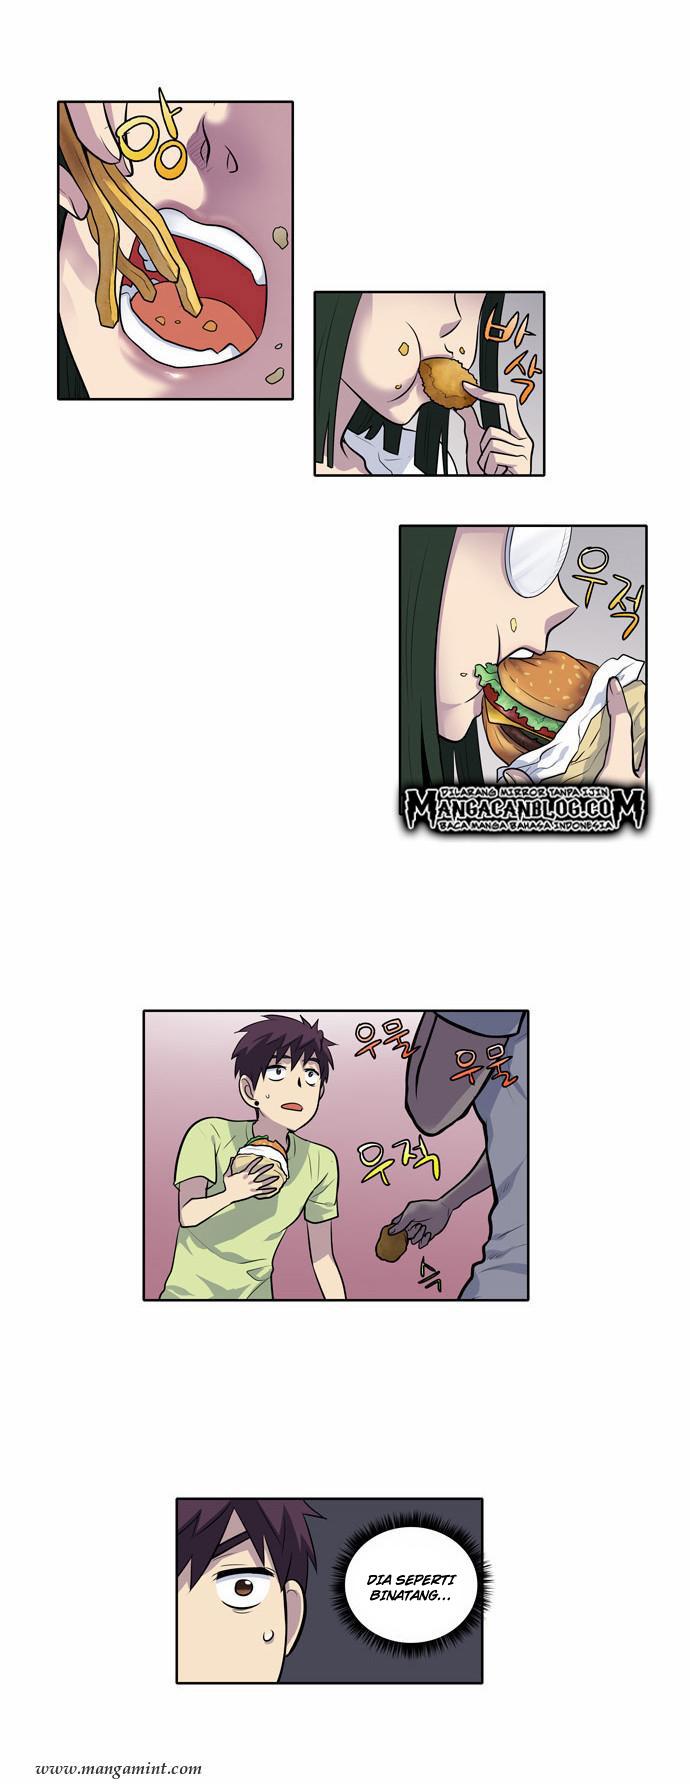 Dilarang COPAS - situs resmi www.mangacanblog.com - Komik the gamer 111 - bagaimana kau tidur dengan level itu? 112 Indonesia the gamer 111 - bagaimana kau tidur dengan level itu? Terbaru 6|Baca Manga Komik Indonesia|Mangacan